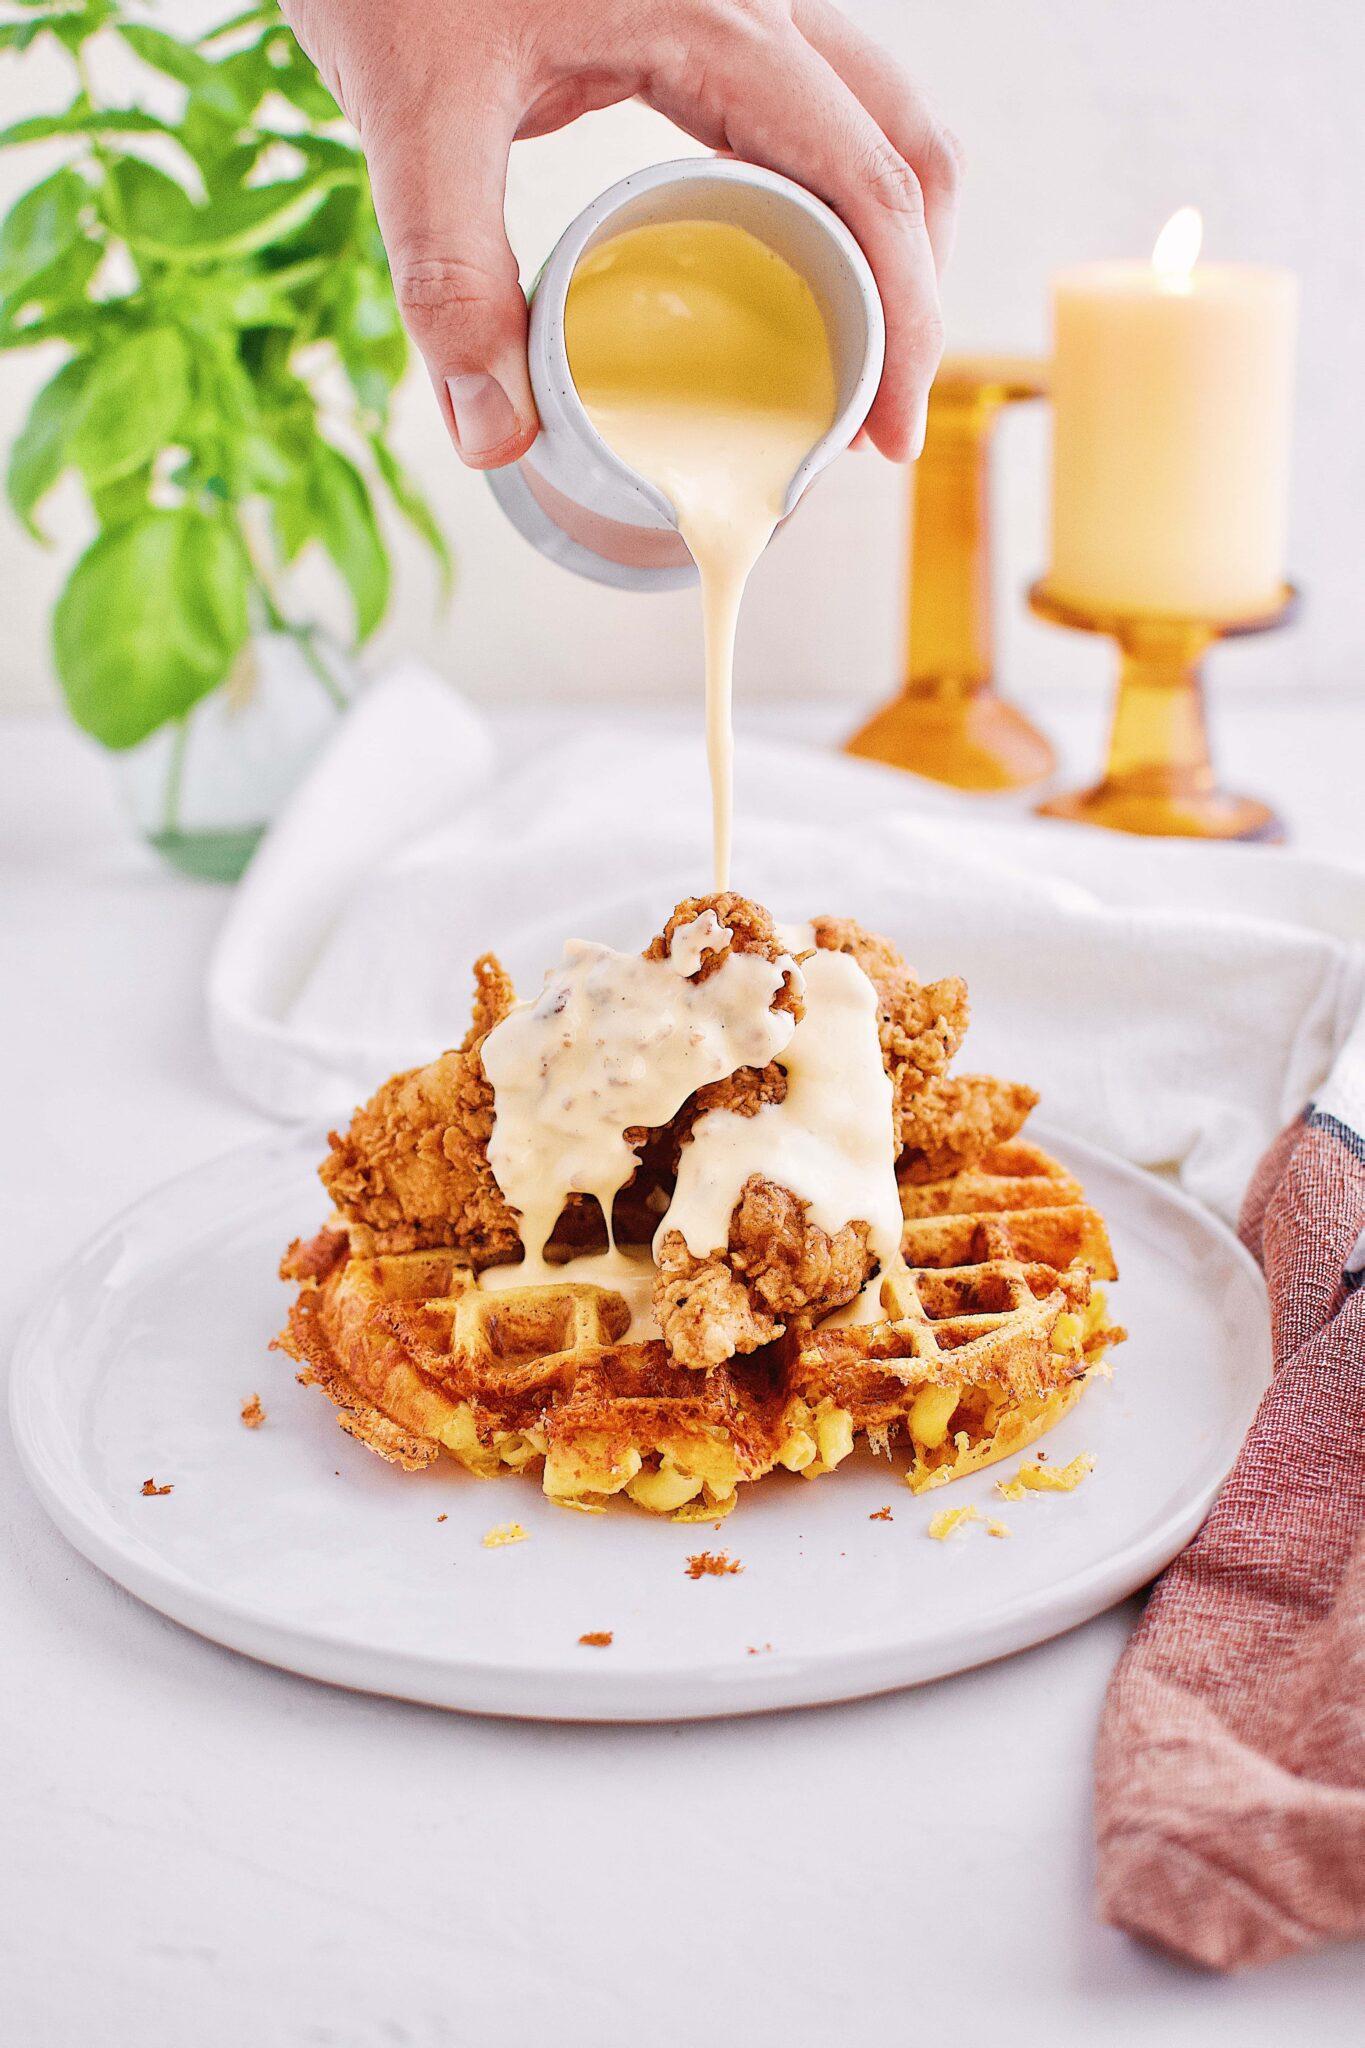 Chicken & Mac n' Cheese Waffle